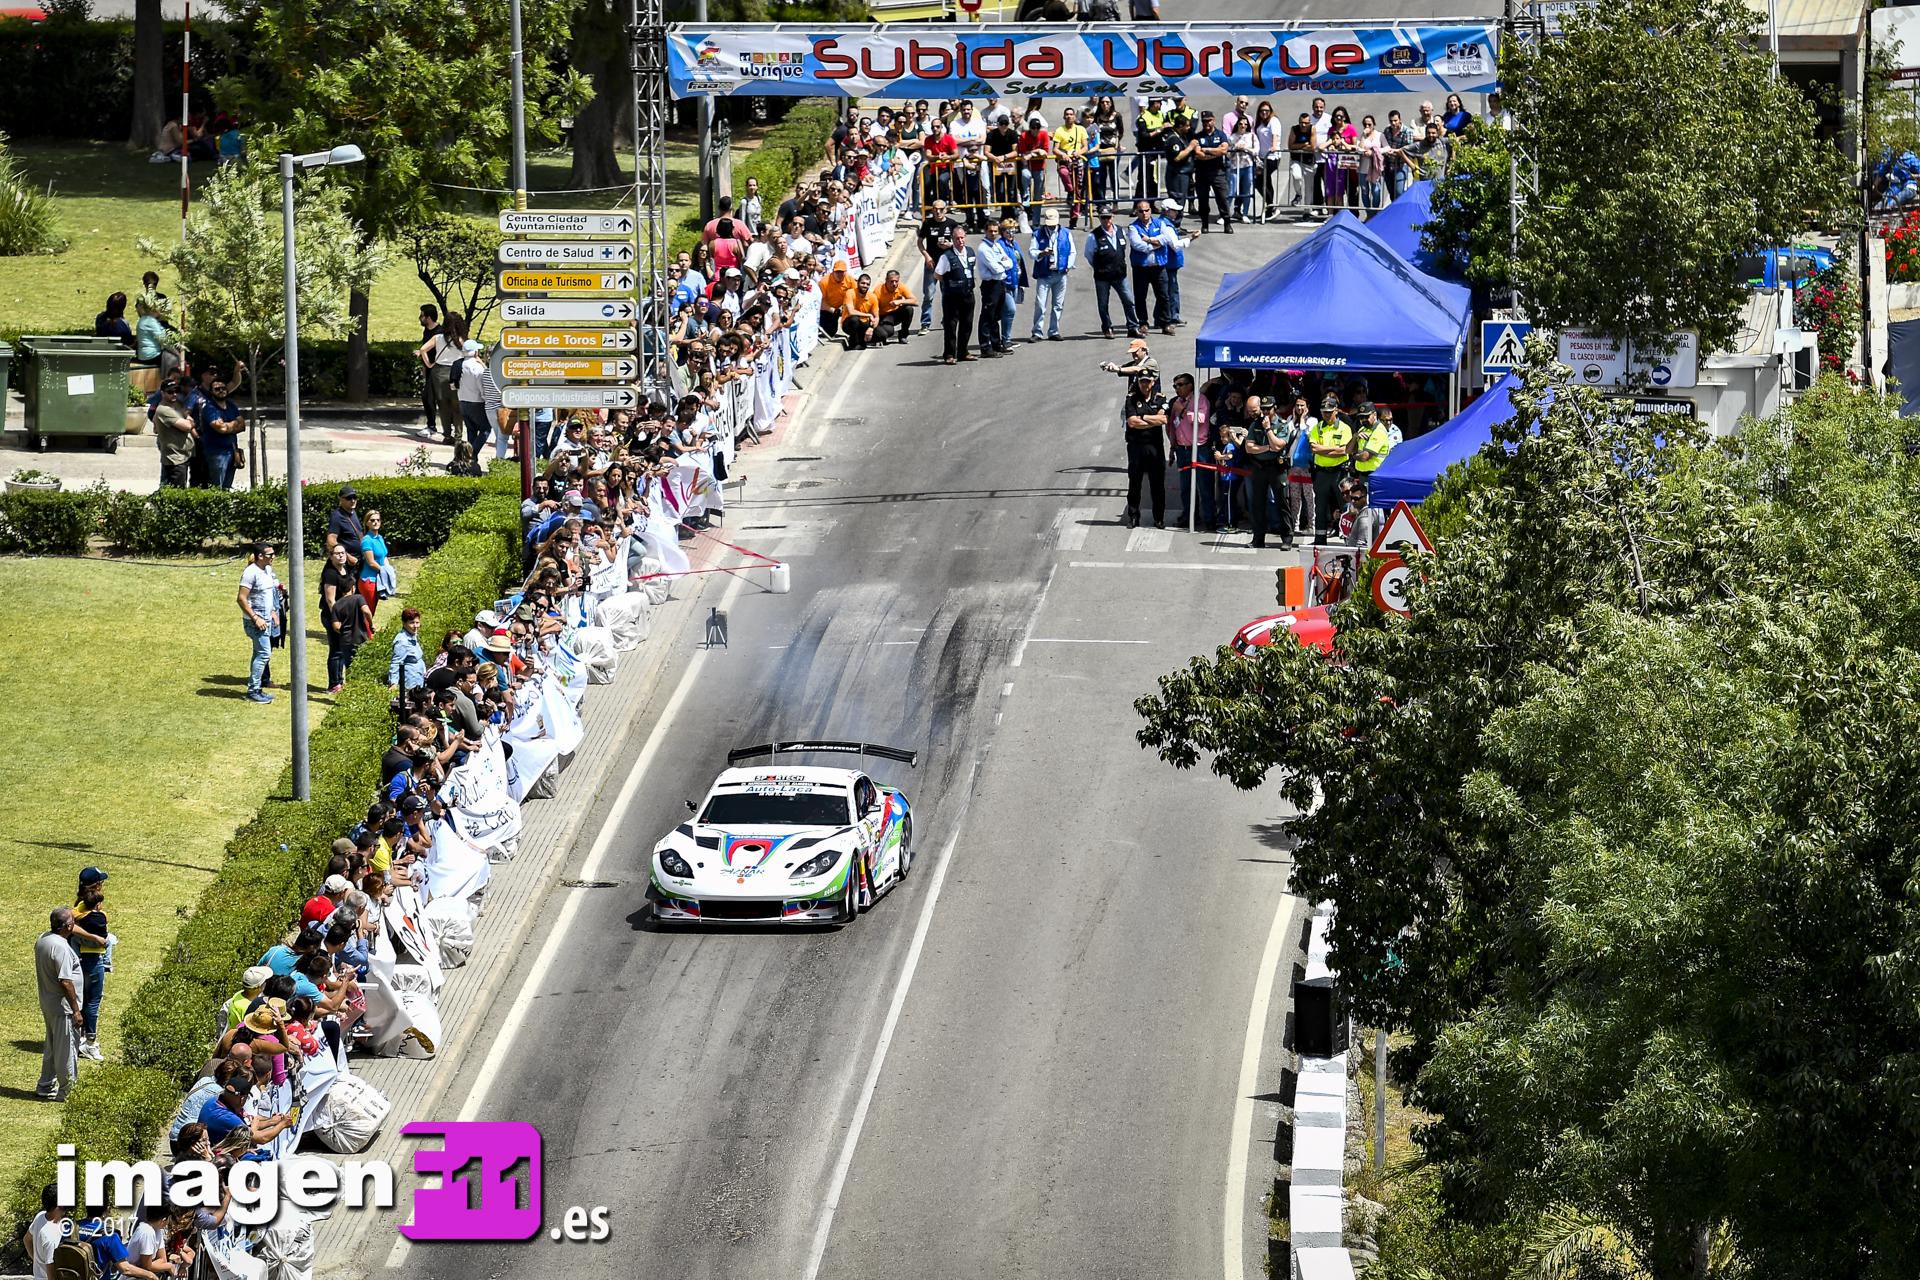 Subida a Ubrique, Ginetta G55 GT3, Jose Antonio Aznar